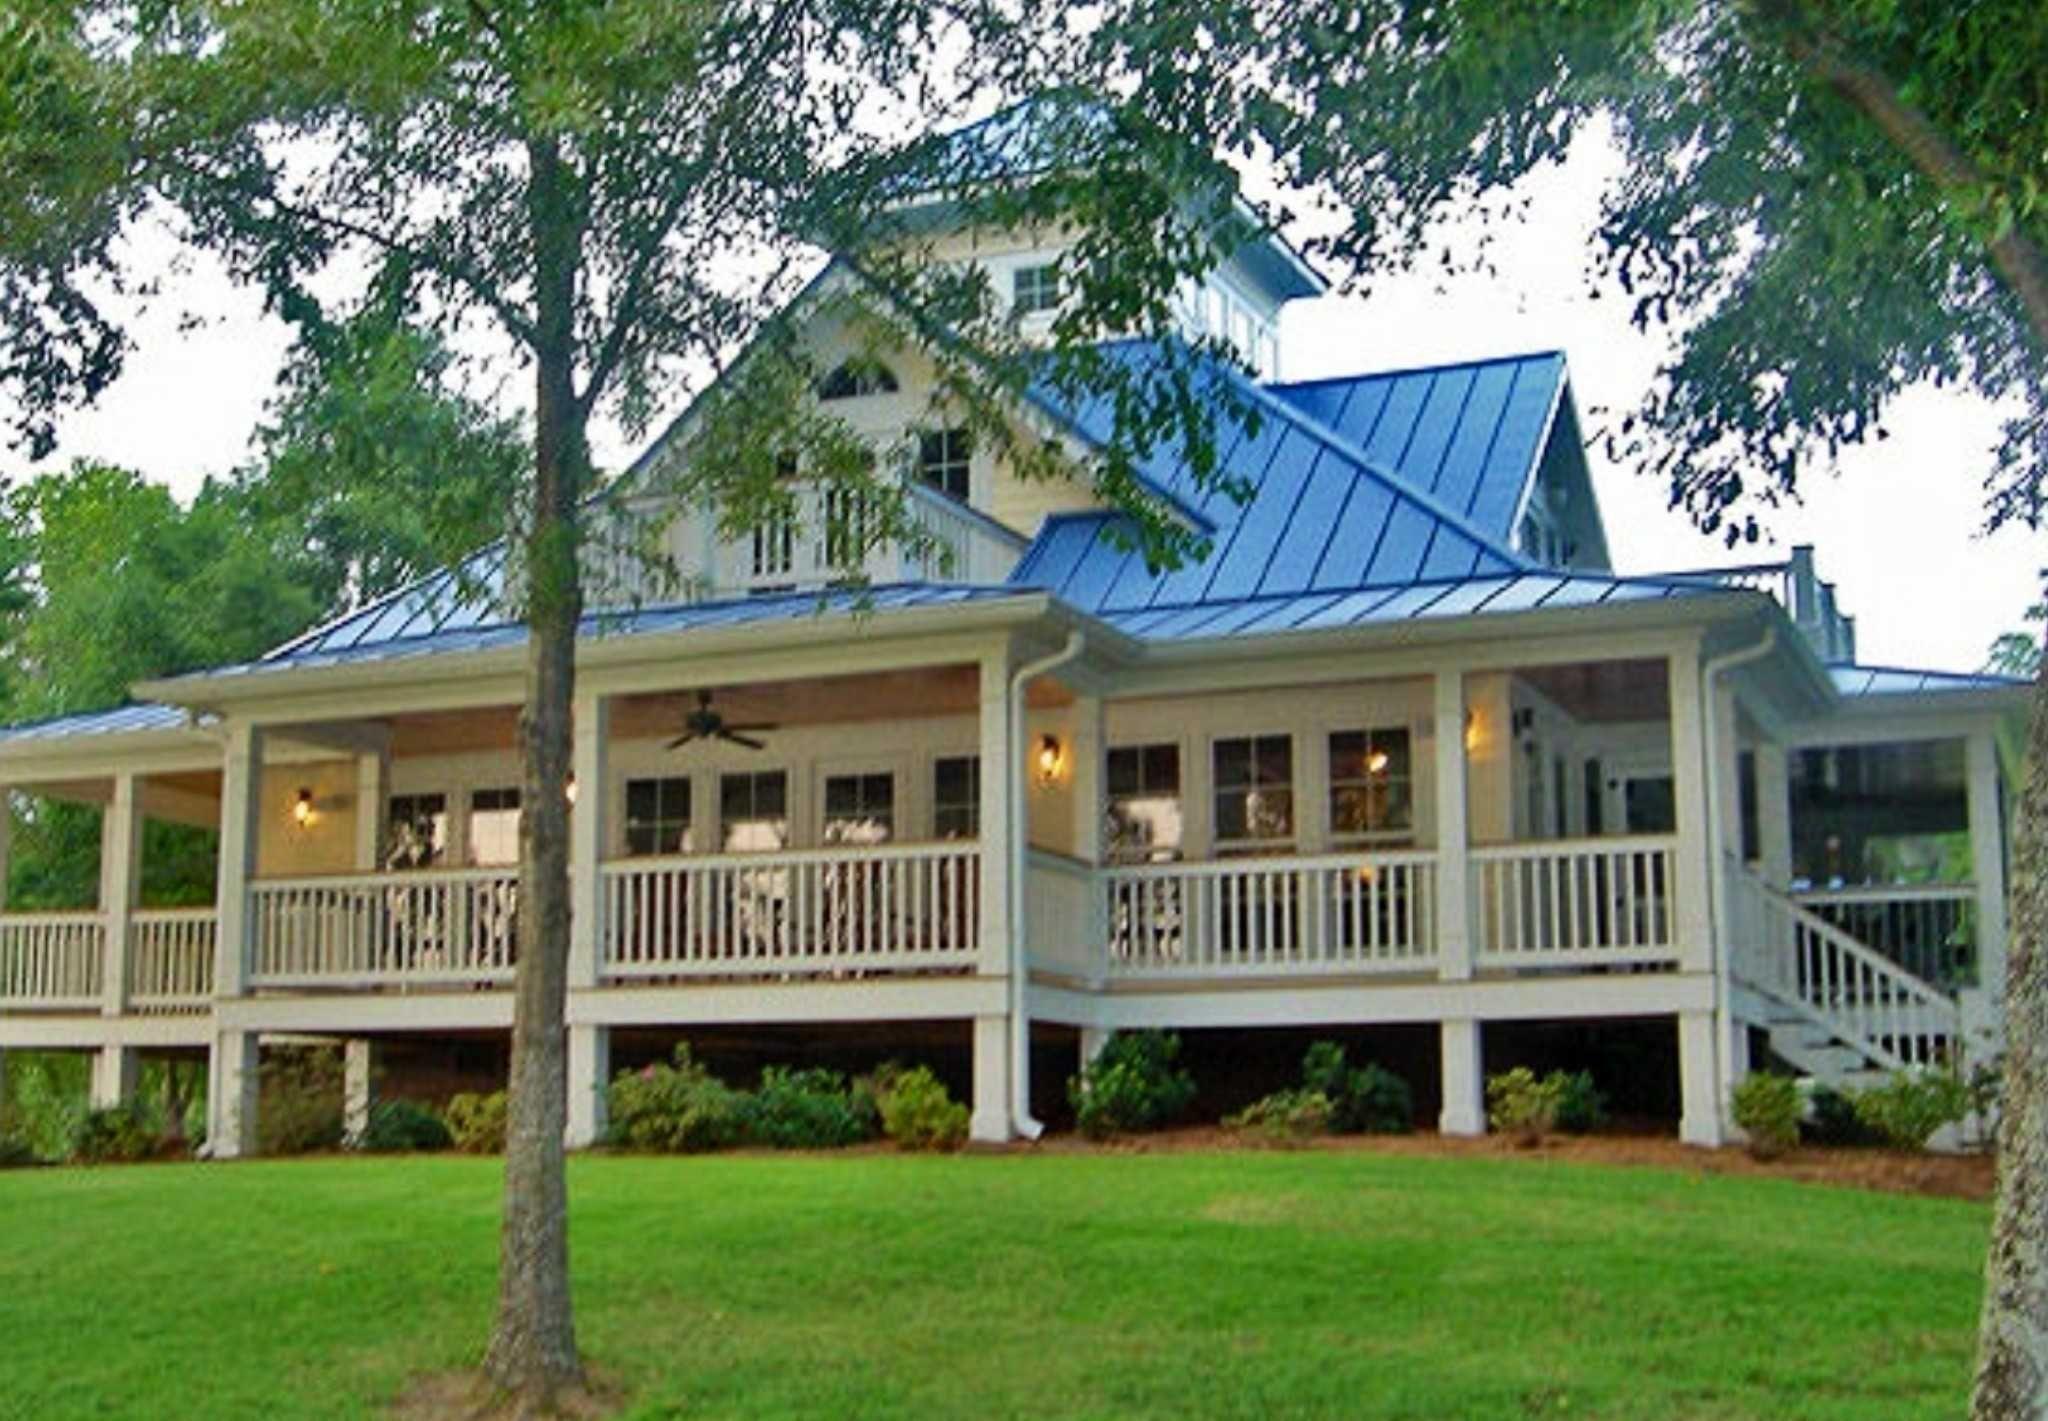 Southern Farmhouse Mansion Elegant Southern Farmhouse Mansion Southern Living Craftsman House Plans Fres Cottage House Plans Cottage Plan Beach House Plans